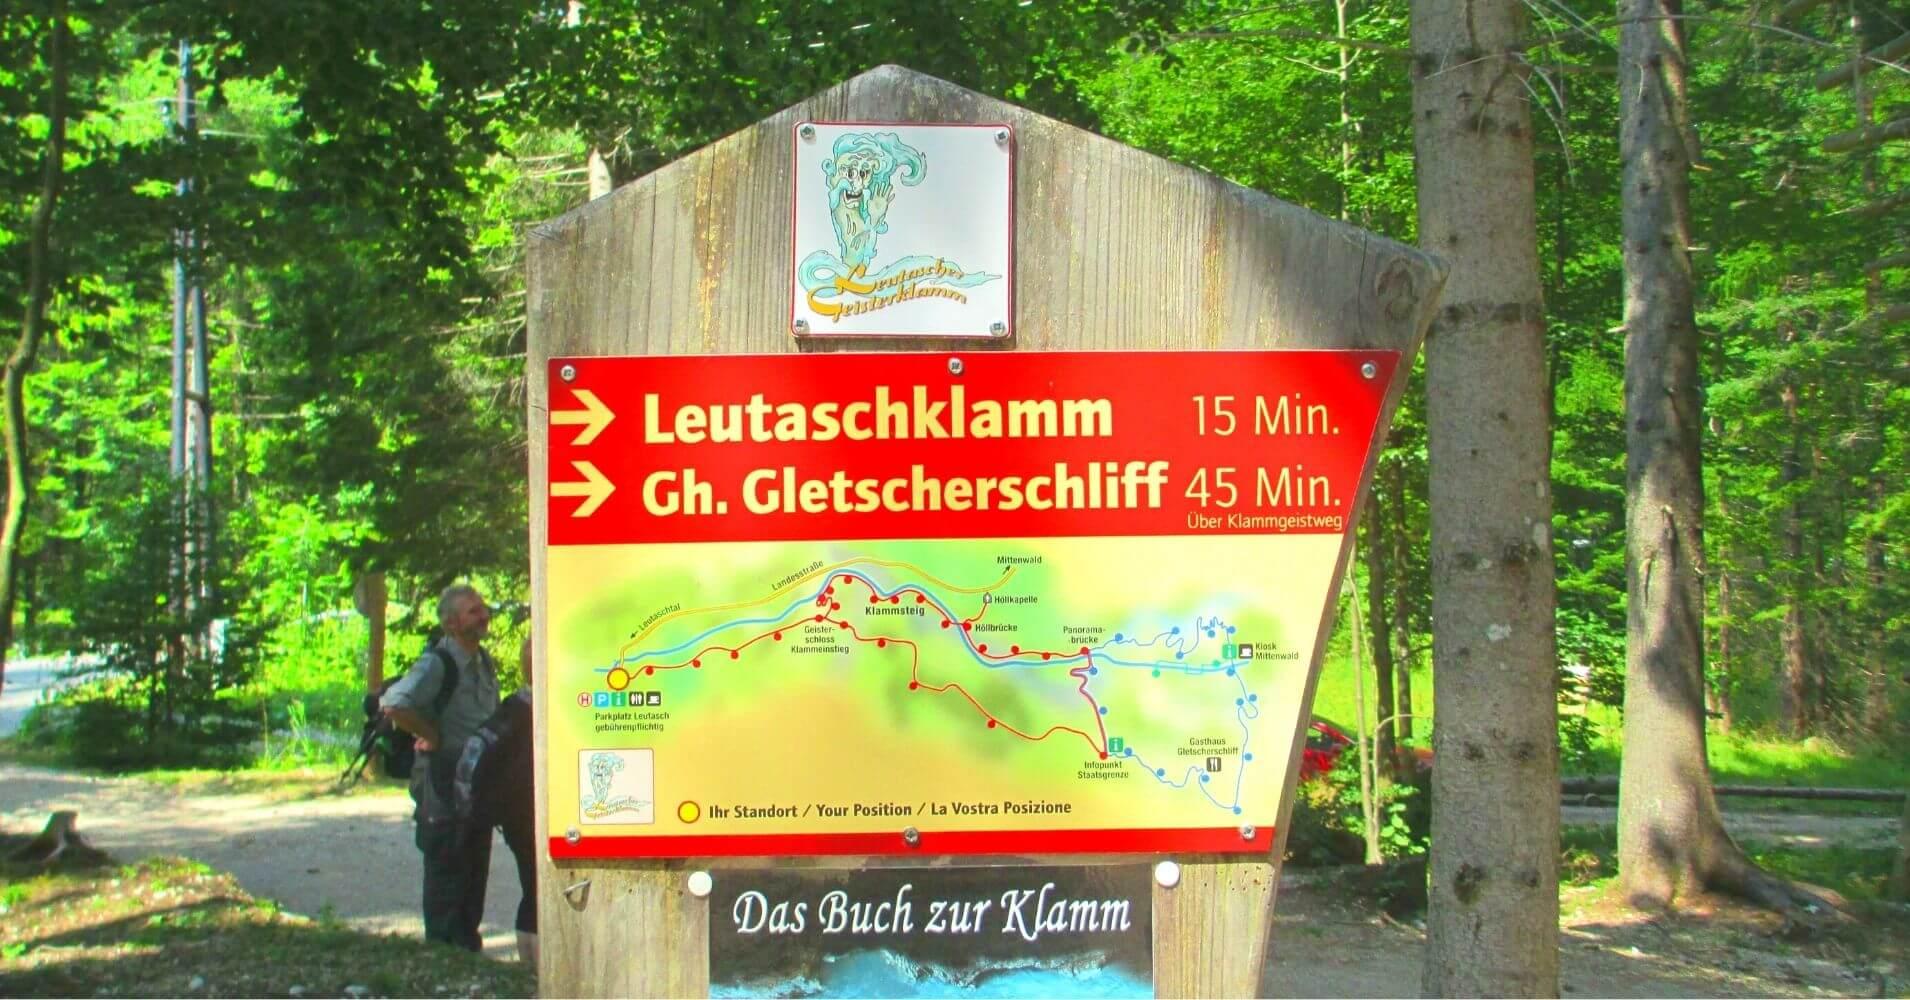 Cartel Informativo. Garganta Leutaschklamm. Schanz, Leutasch. Región del Tirol. Austria.